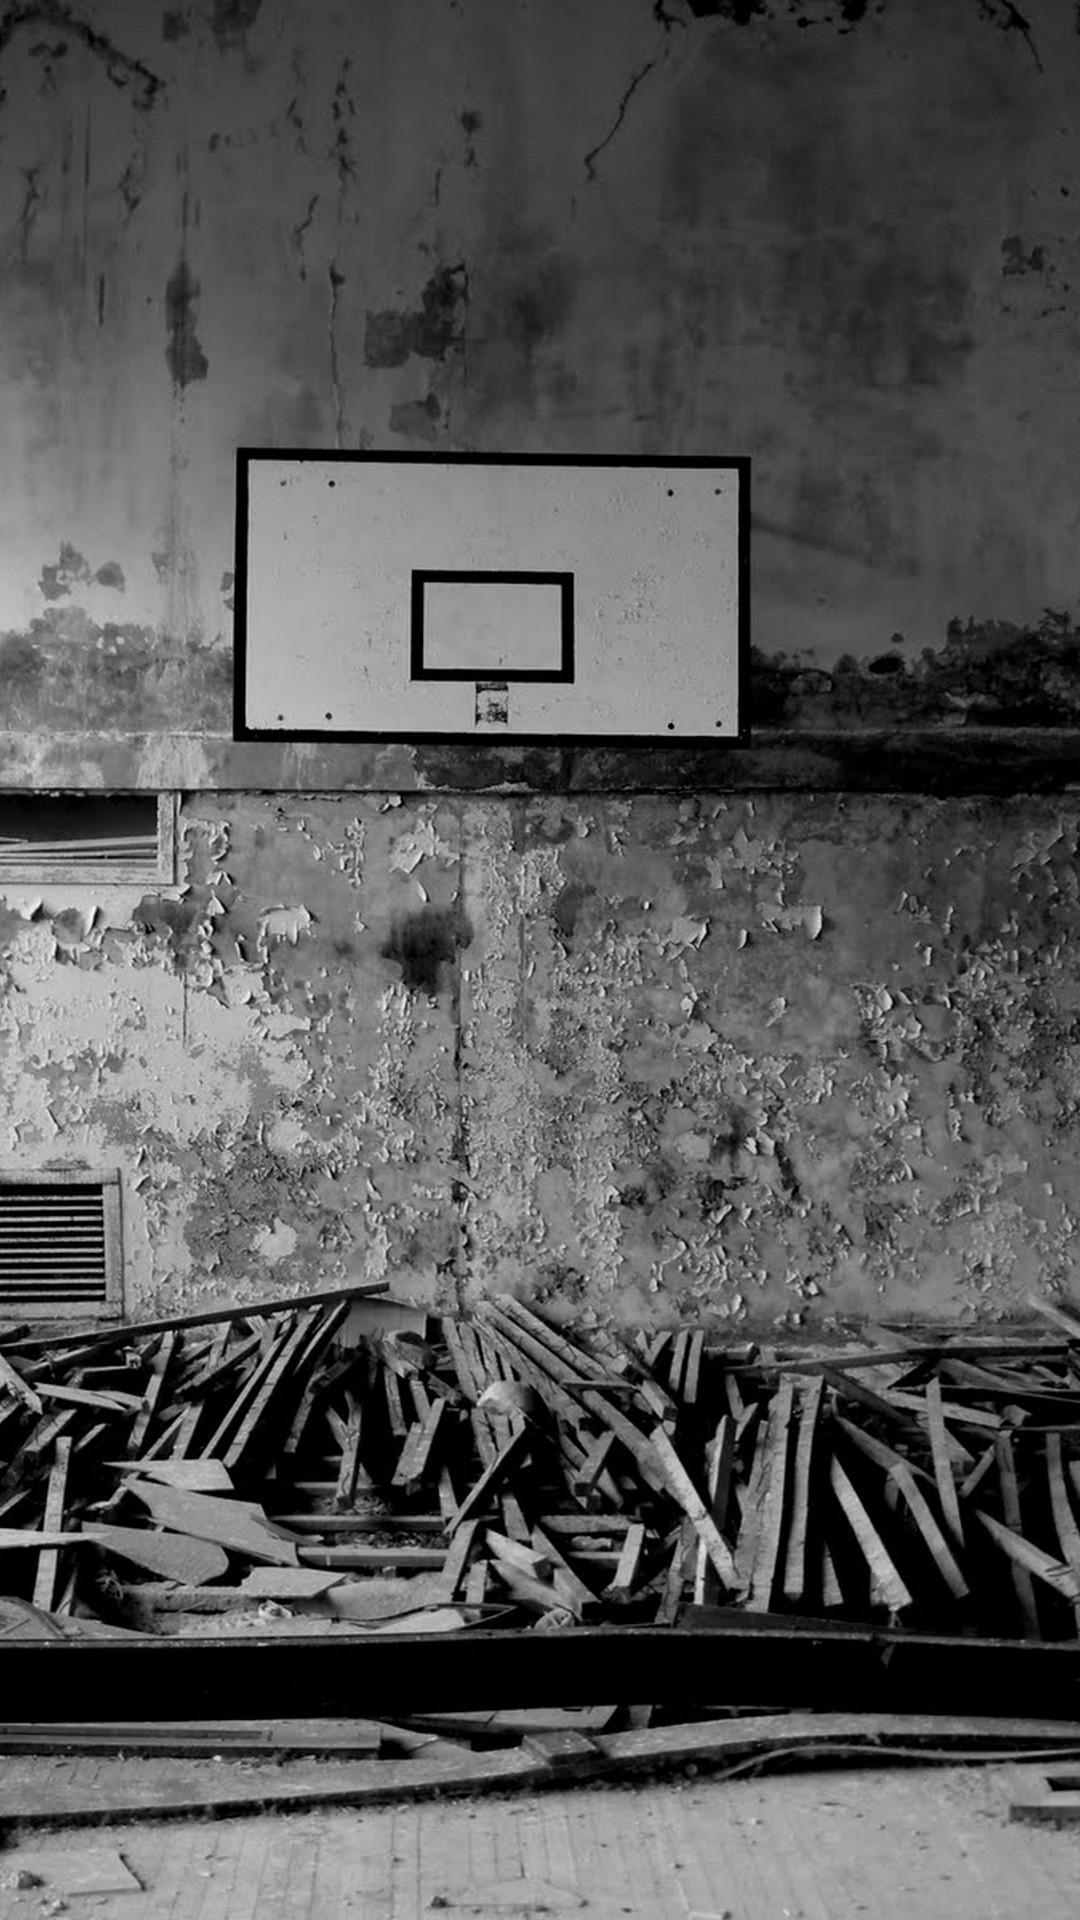 NBA iPhone 7 Plus Wallpaper 2020 Basketball Wallpaper 1080x1920